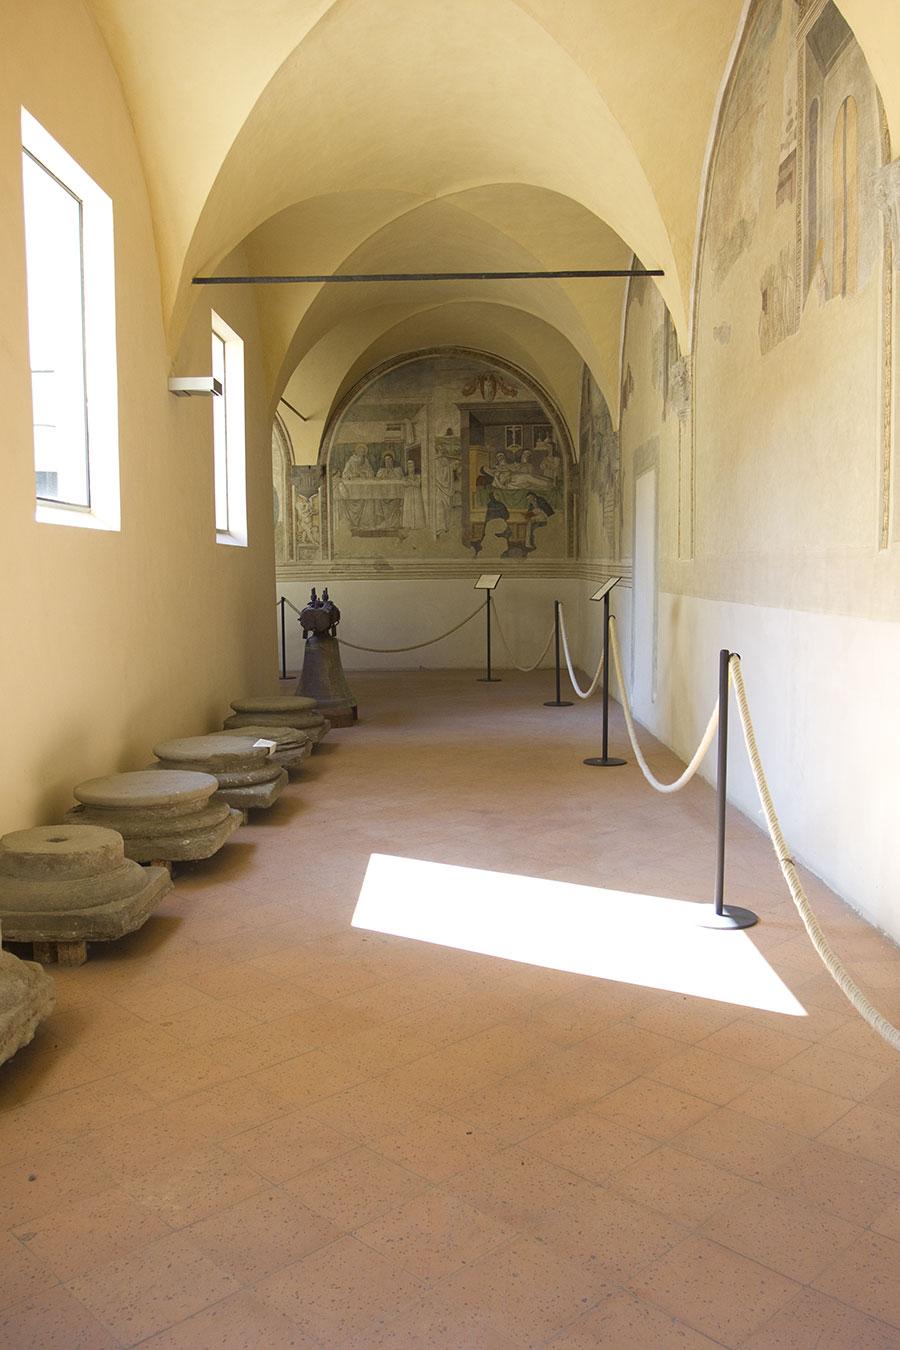 sansepocro la citt di Piero della francesca  the city of